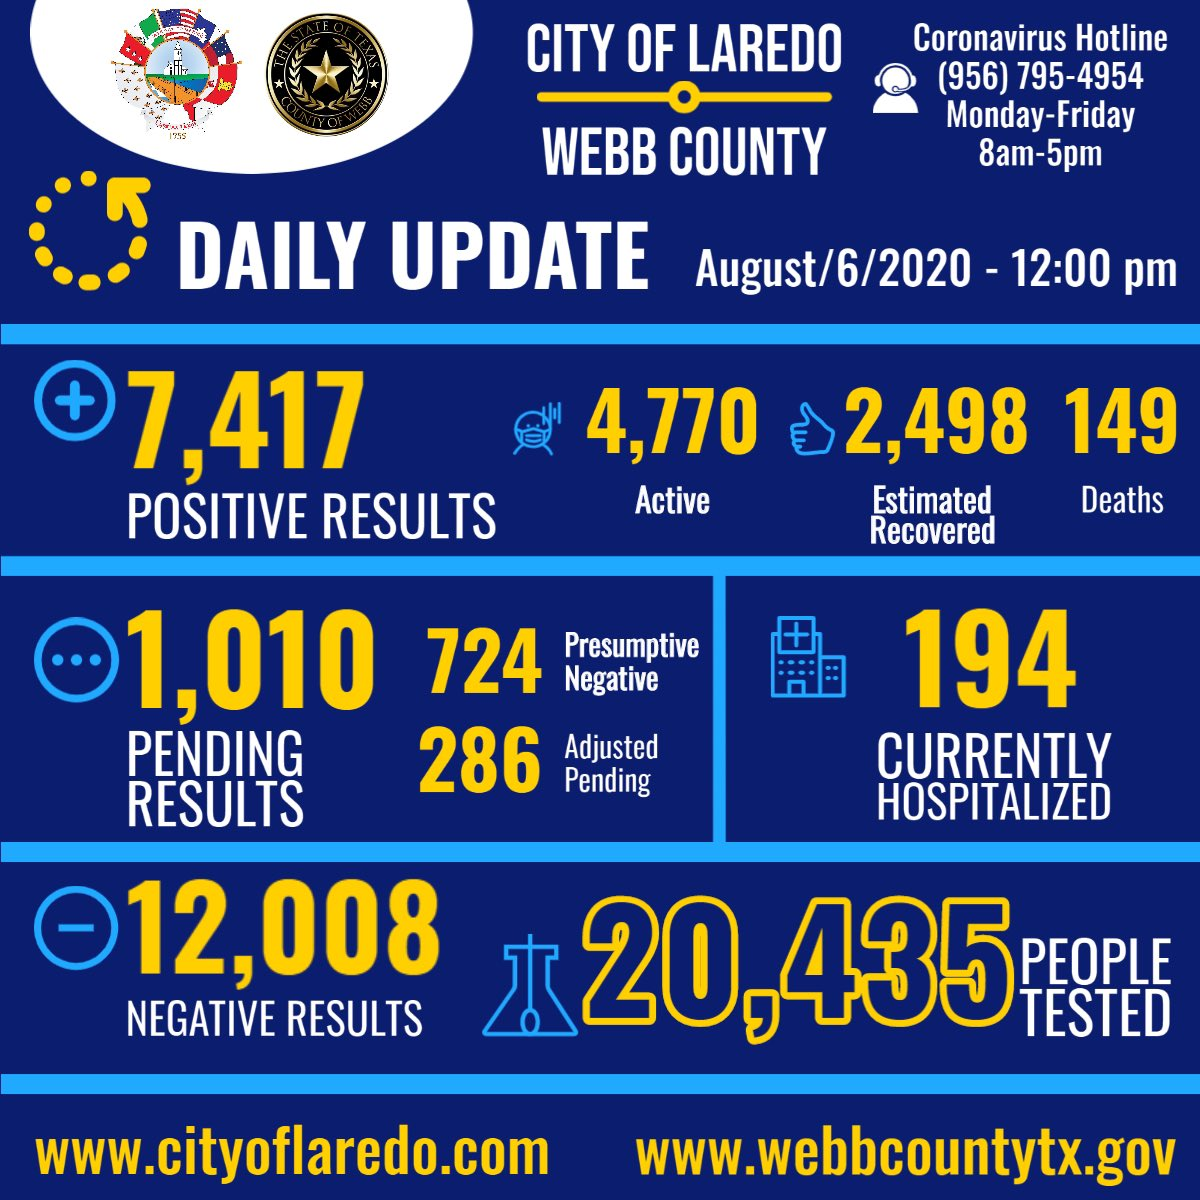 Webb County (@WebbCounty) on Twitter photo 2020-08-06 17:00:05